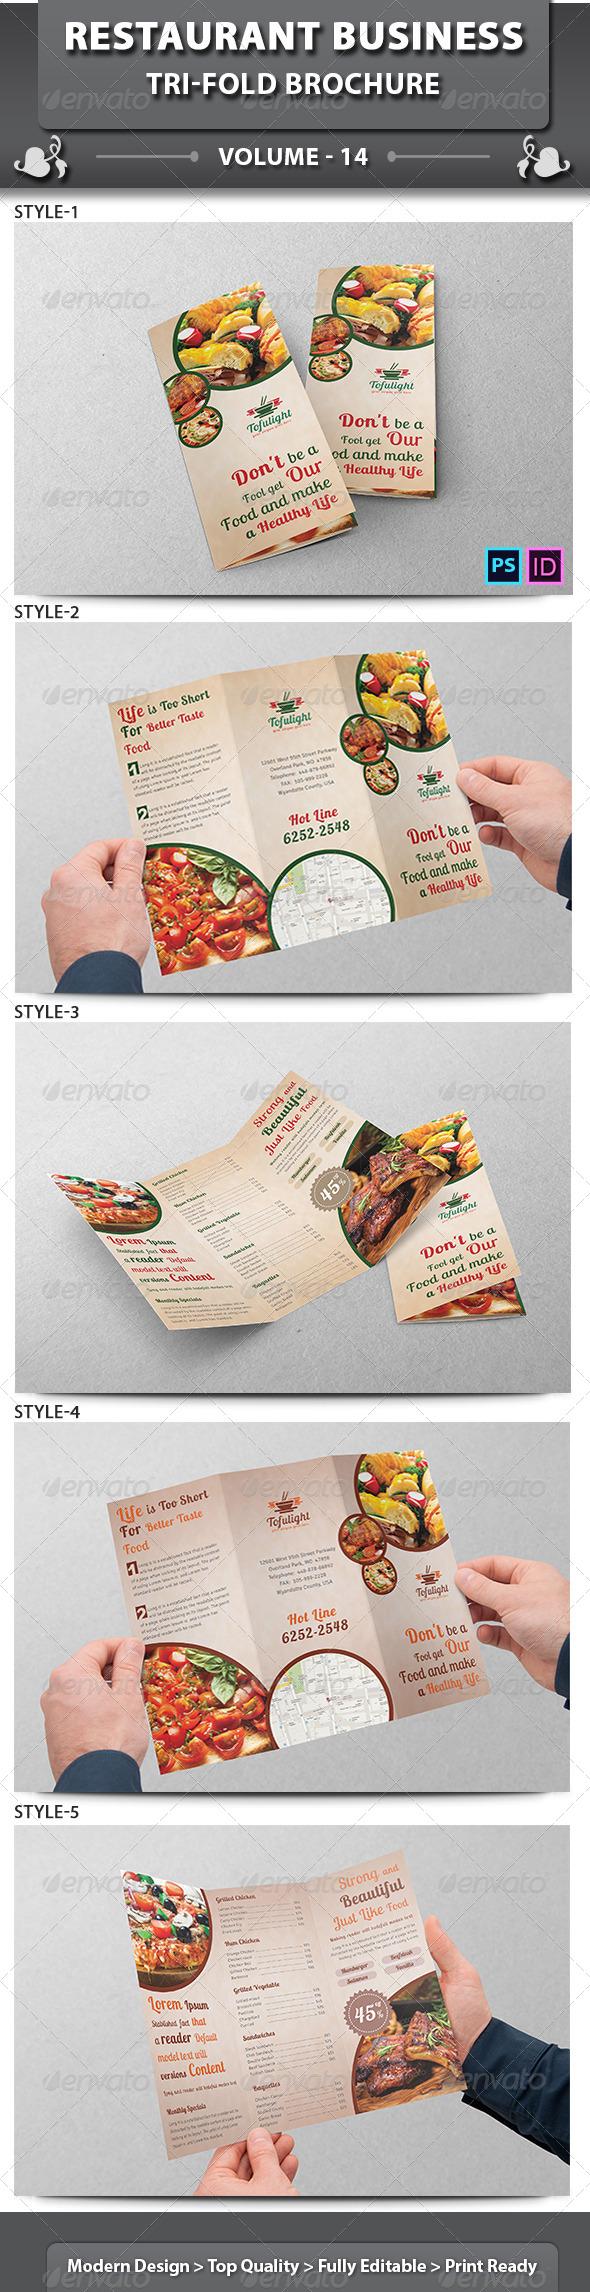 GraphicRiver Restaurant Business Tri-fold Brochure Volume 14 6616739